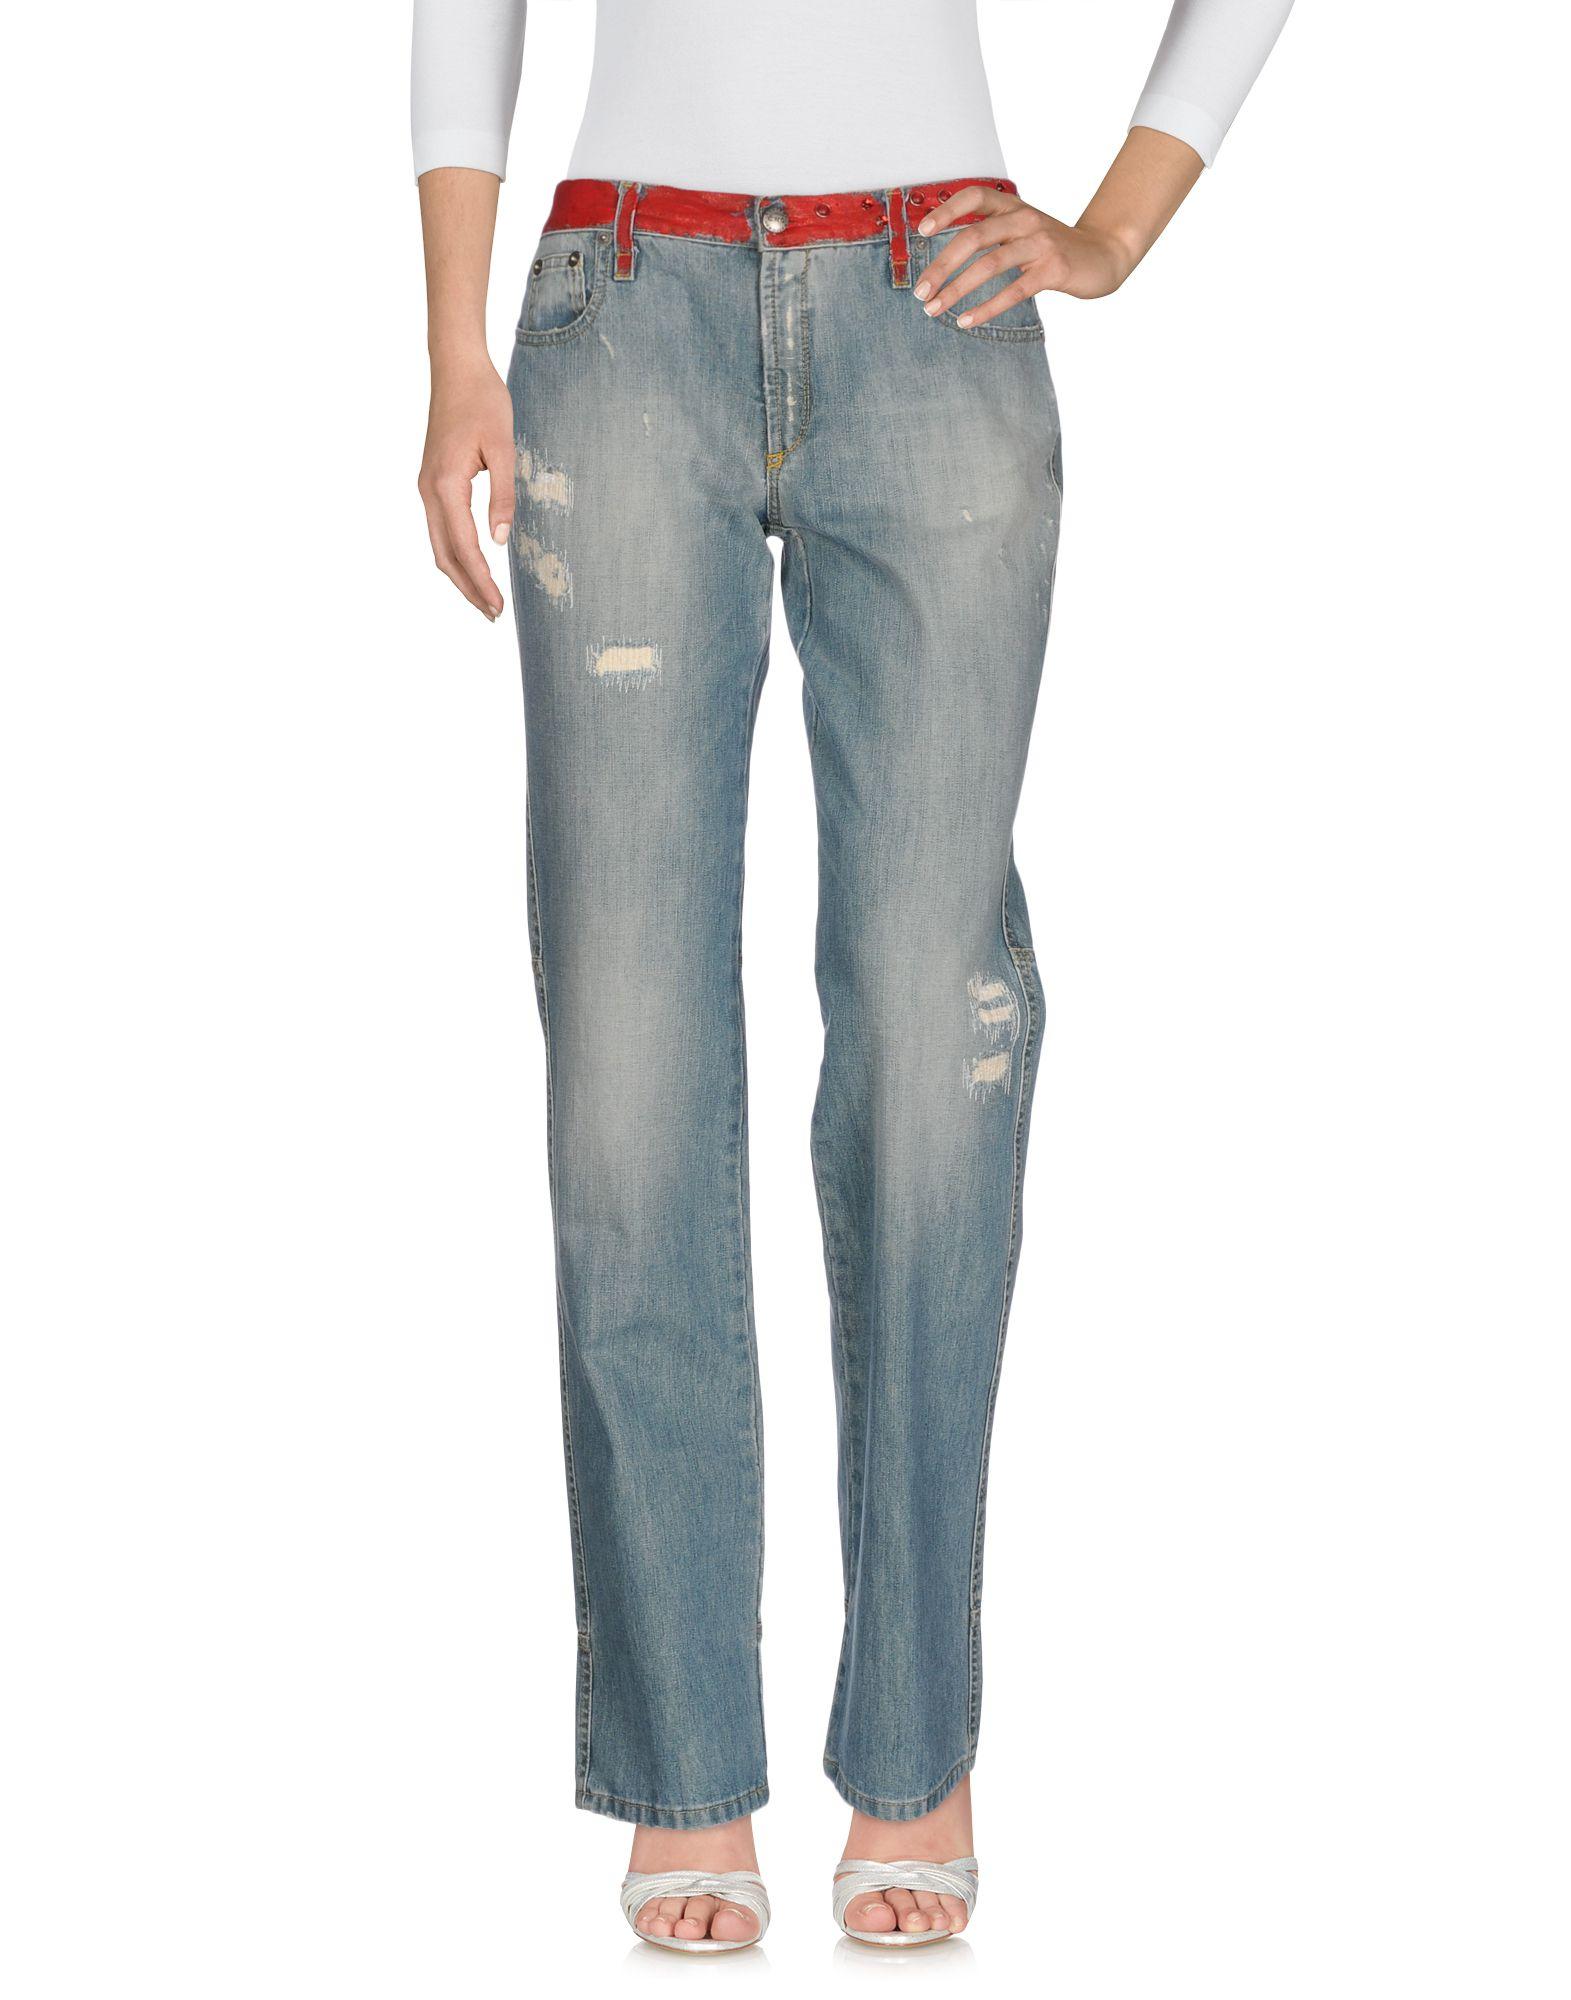 Pantaloni Jeans C'n'c' Costume National Donna - Acquista online su 9Z5aqq9Yef